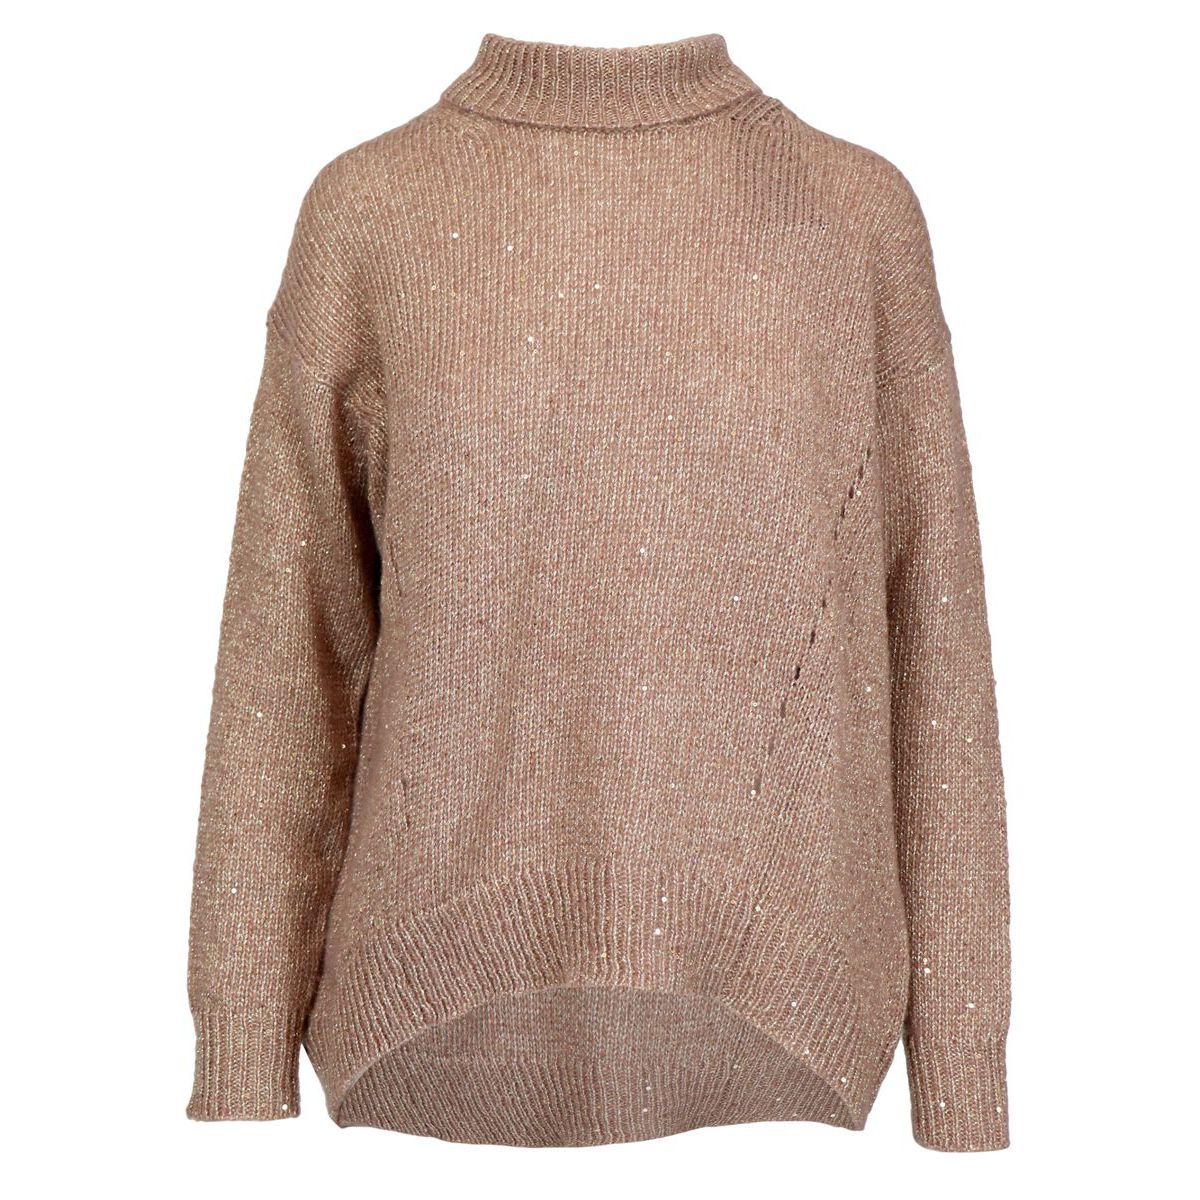 Lurex wool blend turtleneck sweater Honey Alpha Studio